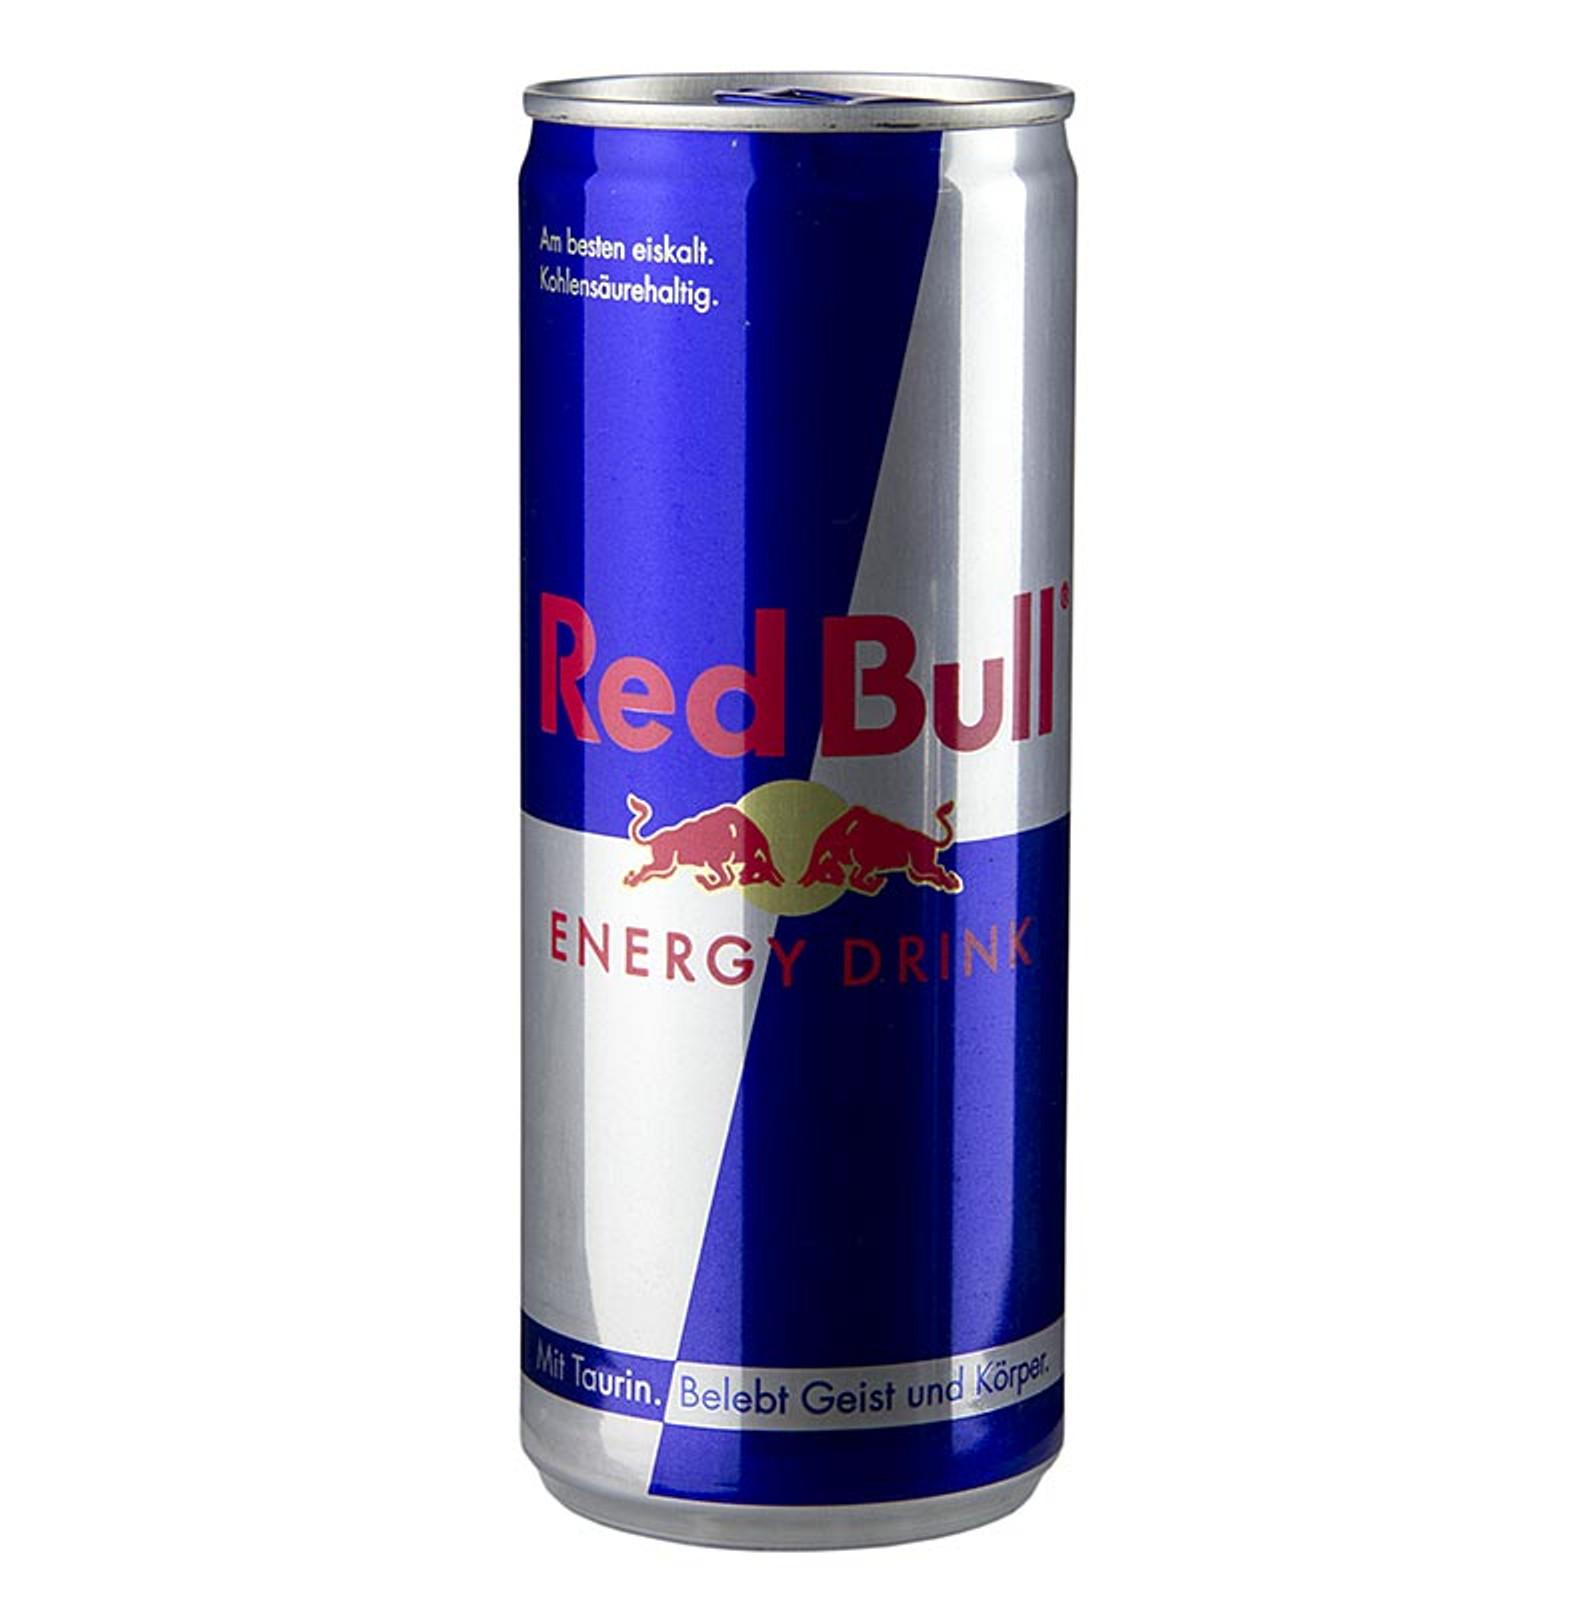 red bull energy drink koffeinhaltig 250 ml getr nke. Black Bedroom Furniture Sets. Home Design Ideas